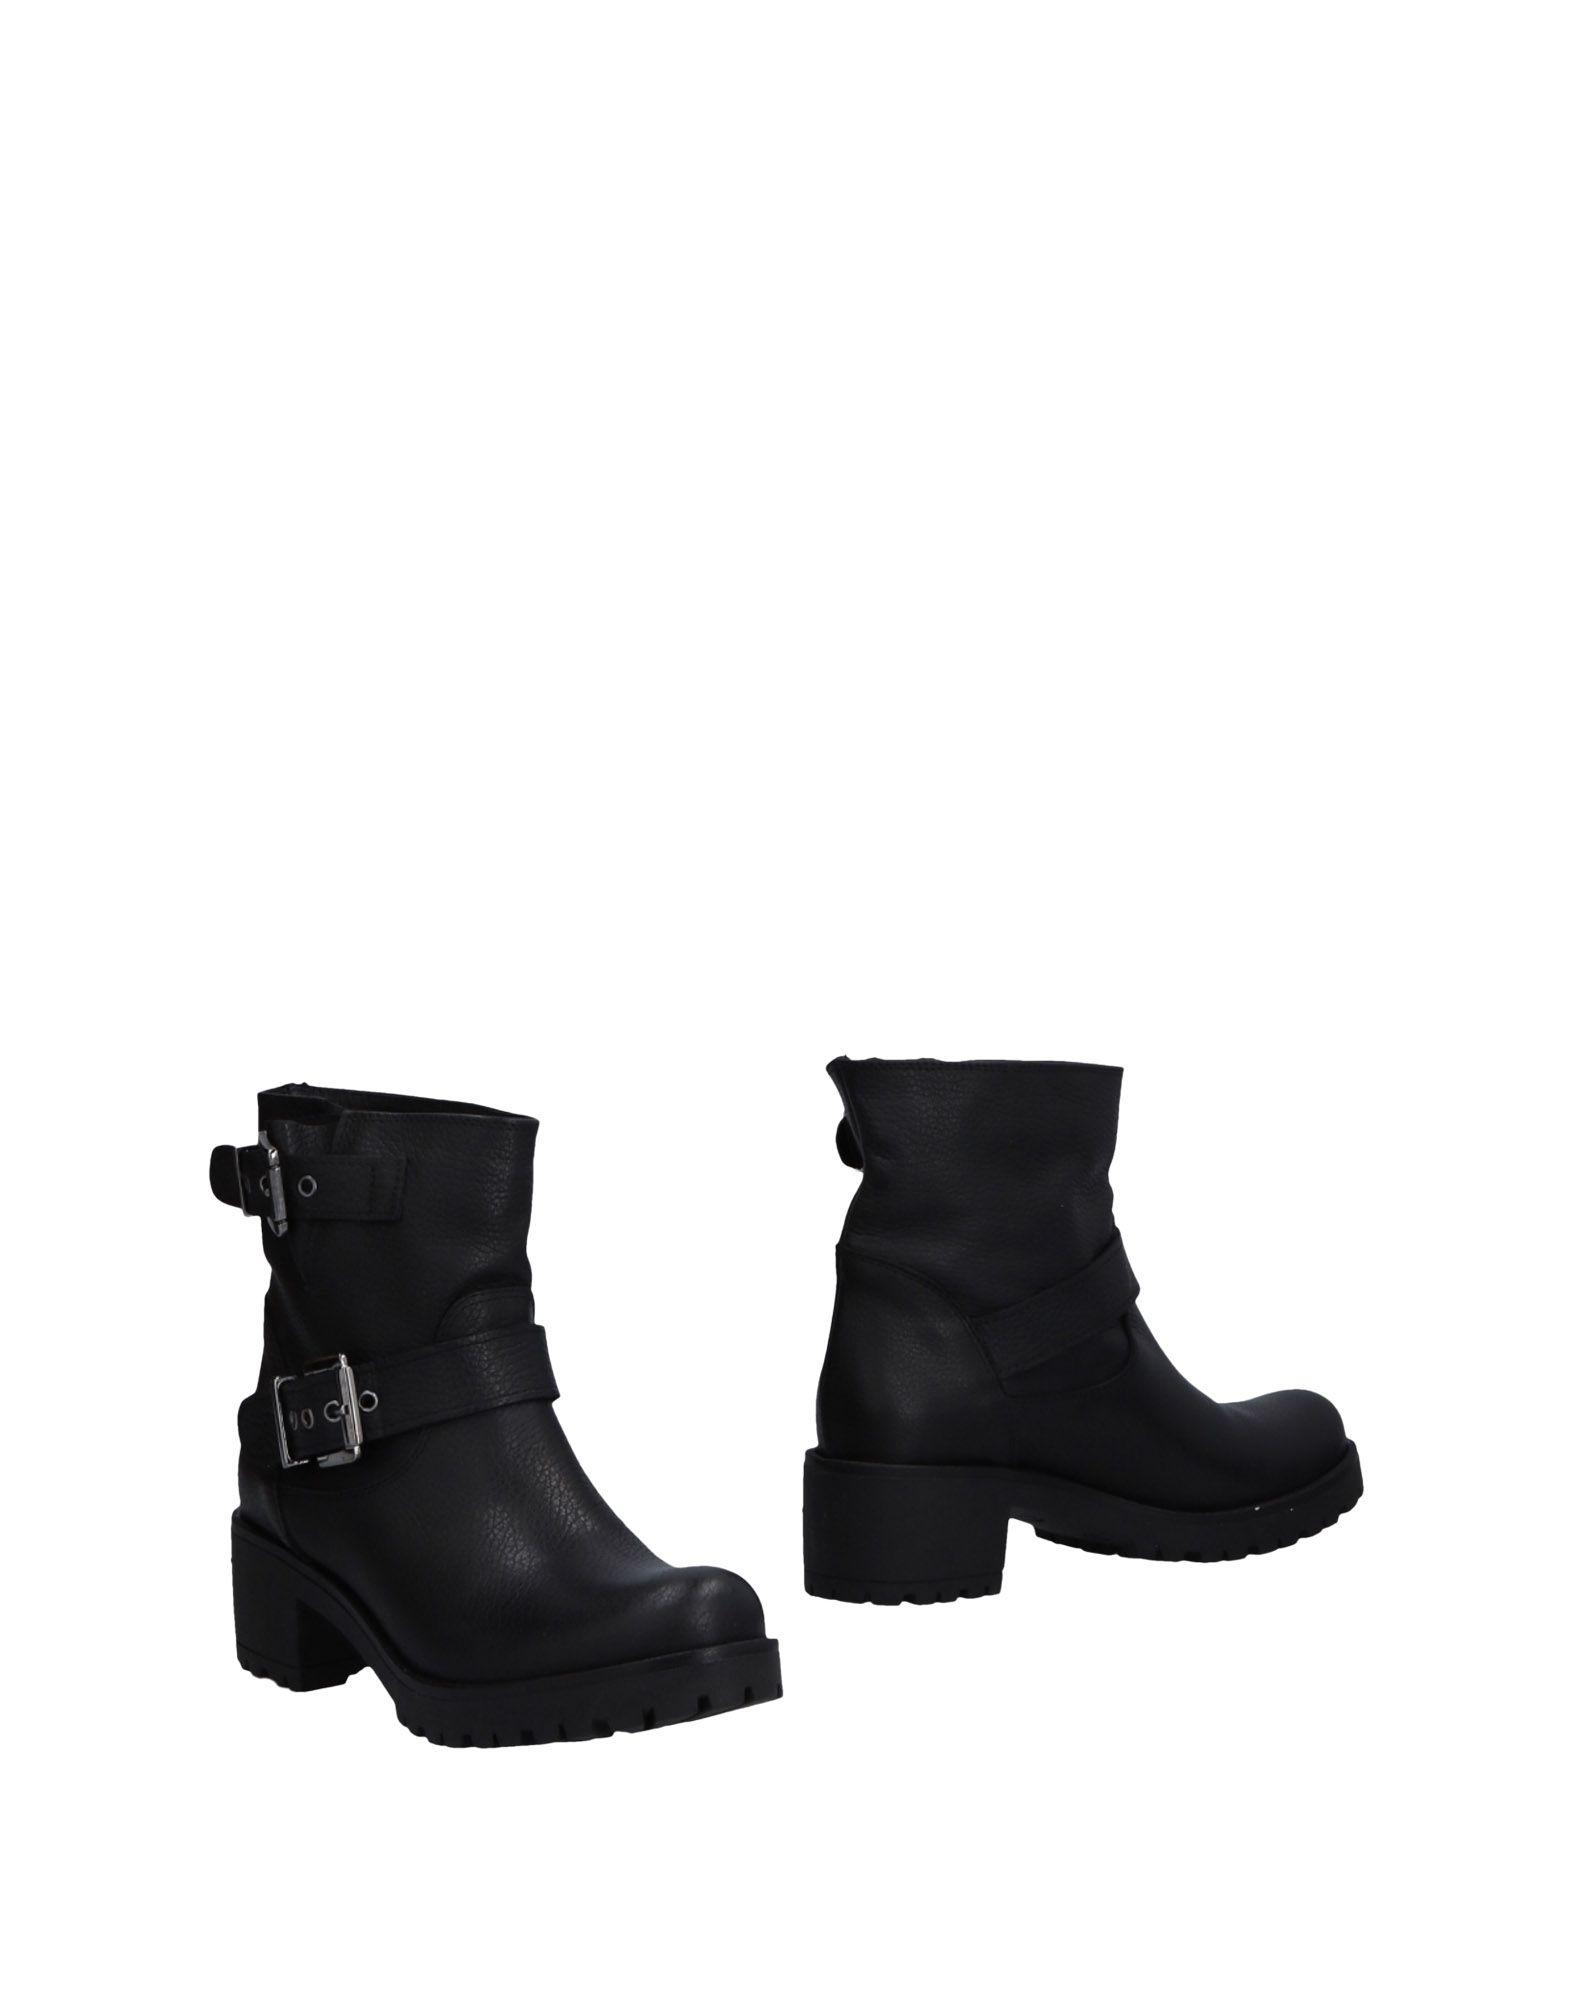 Unlace Stiefelette Damen  11472644JI Gute Qualität beliebte Schuhe